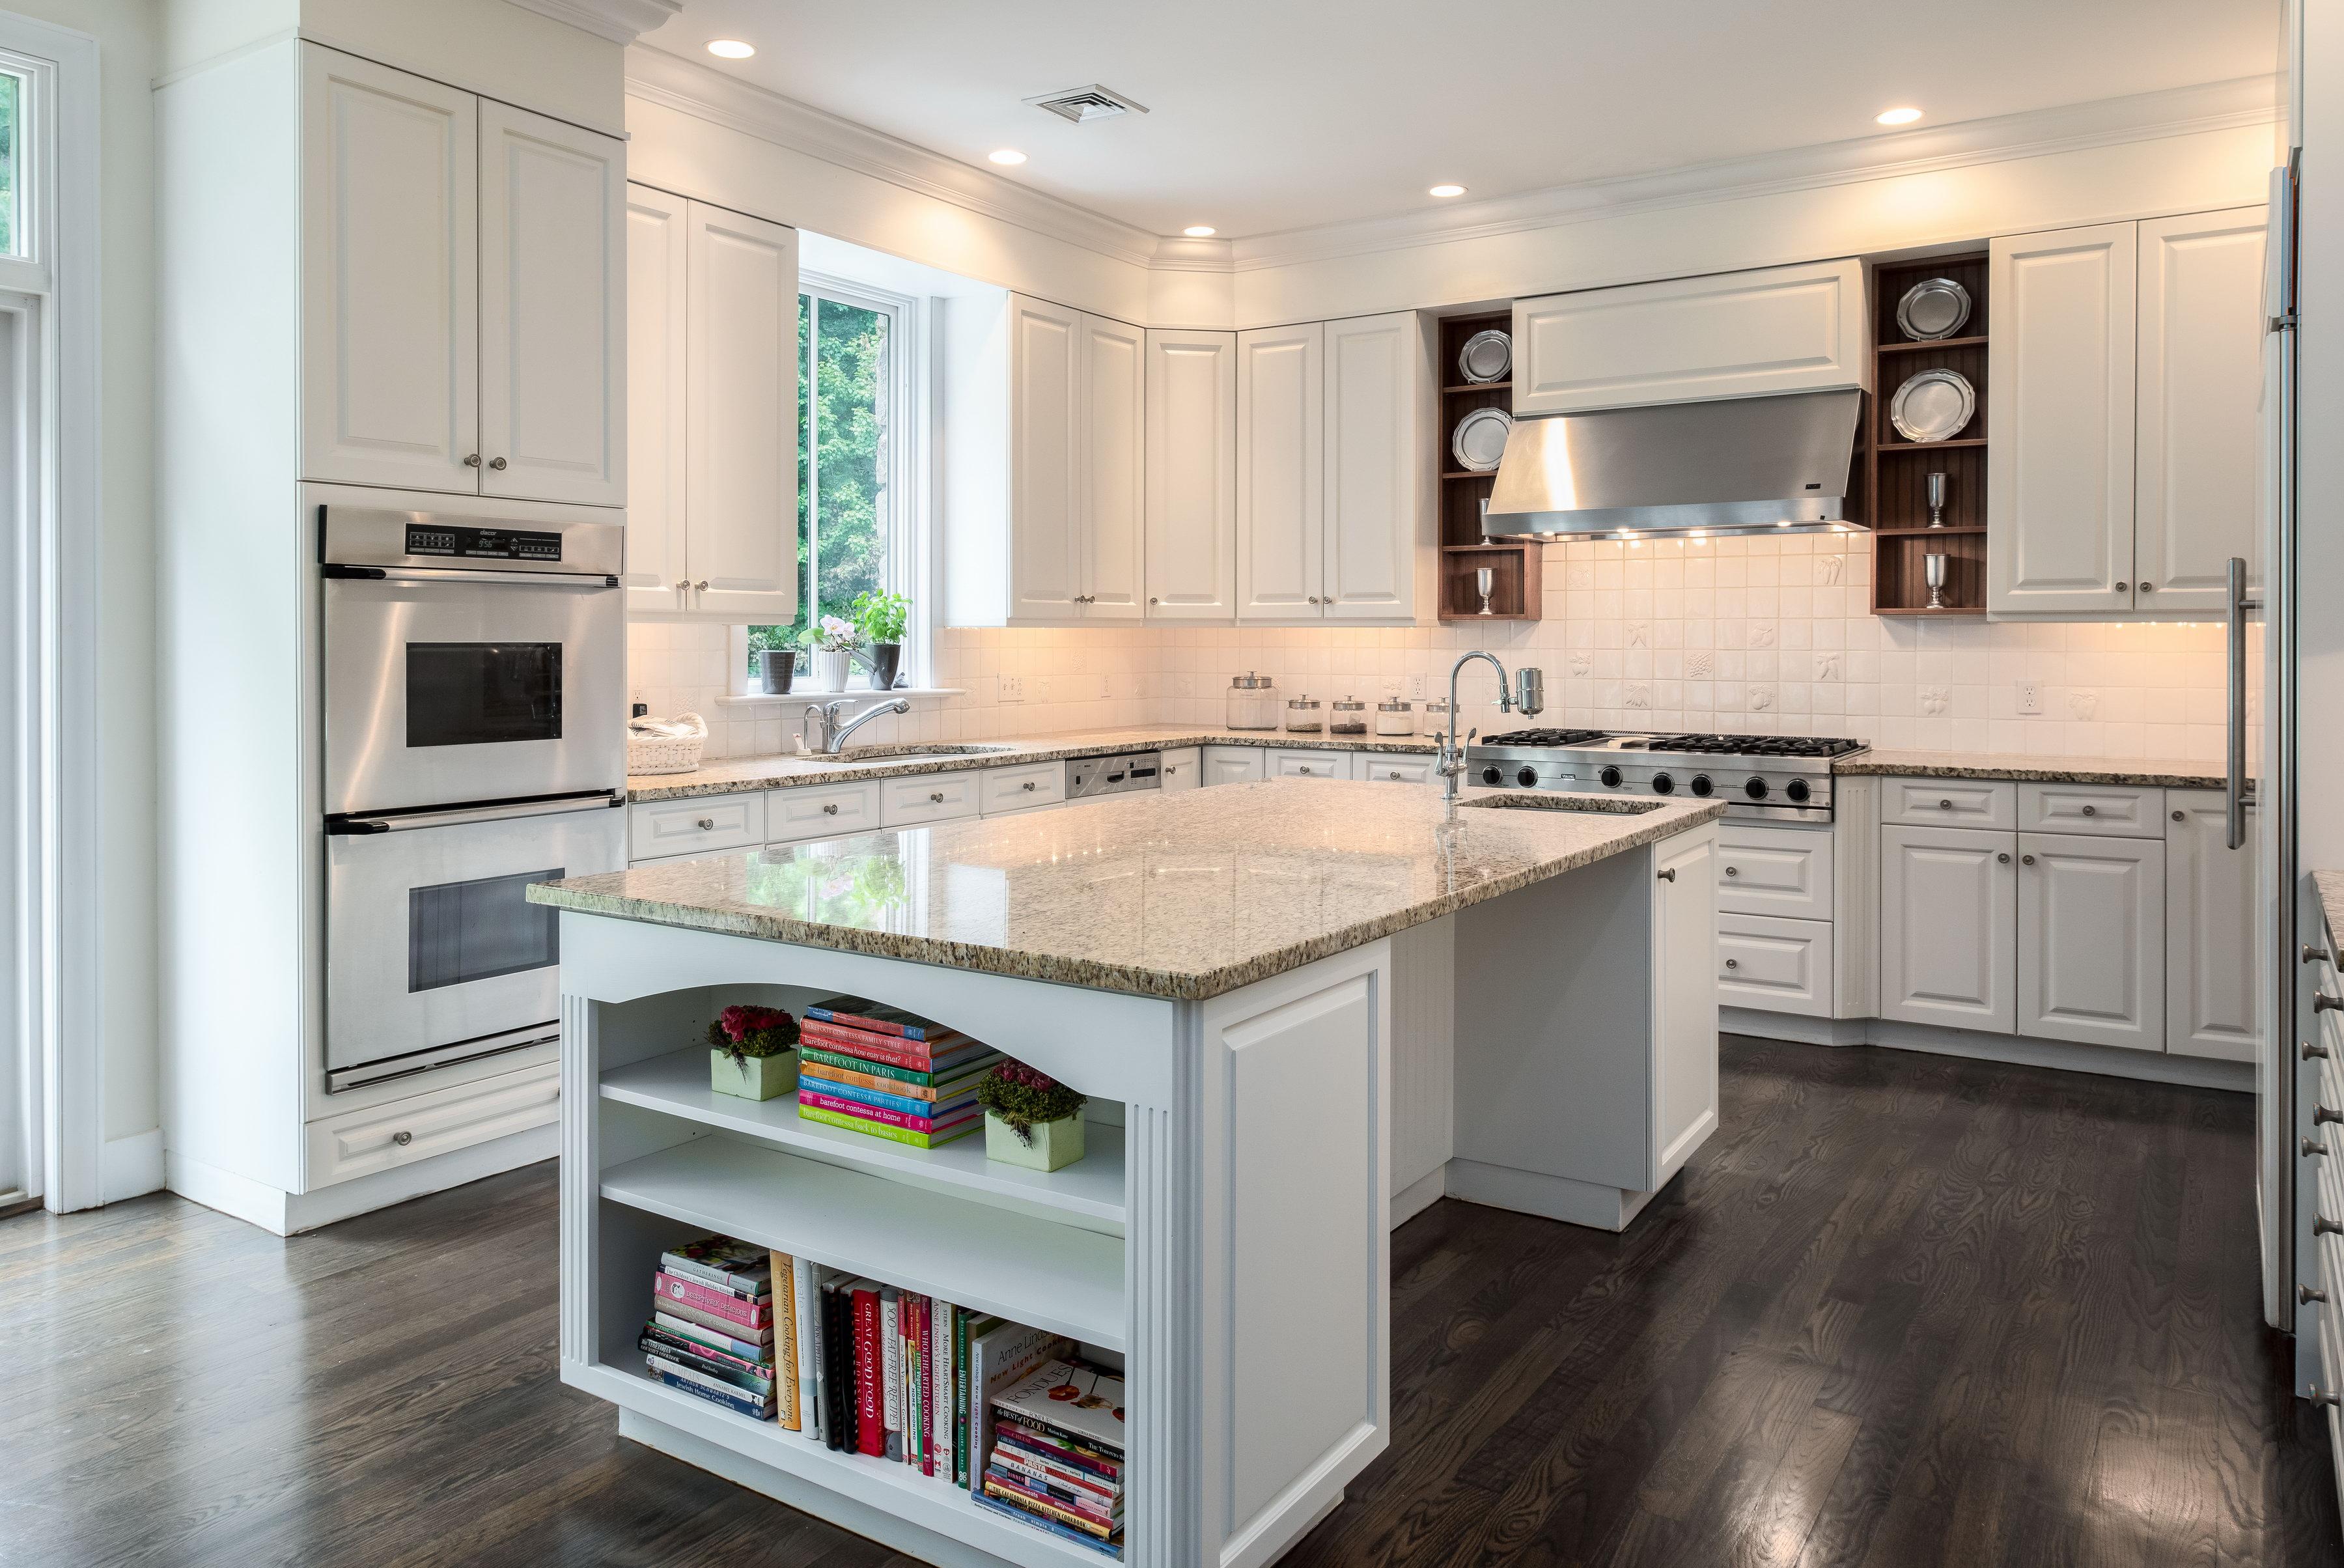 anne lindsays light kitchen